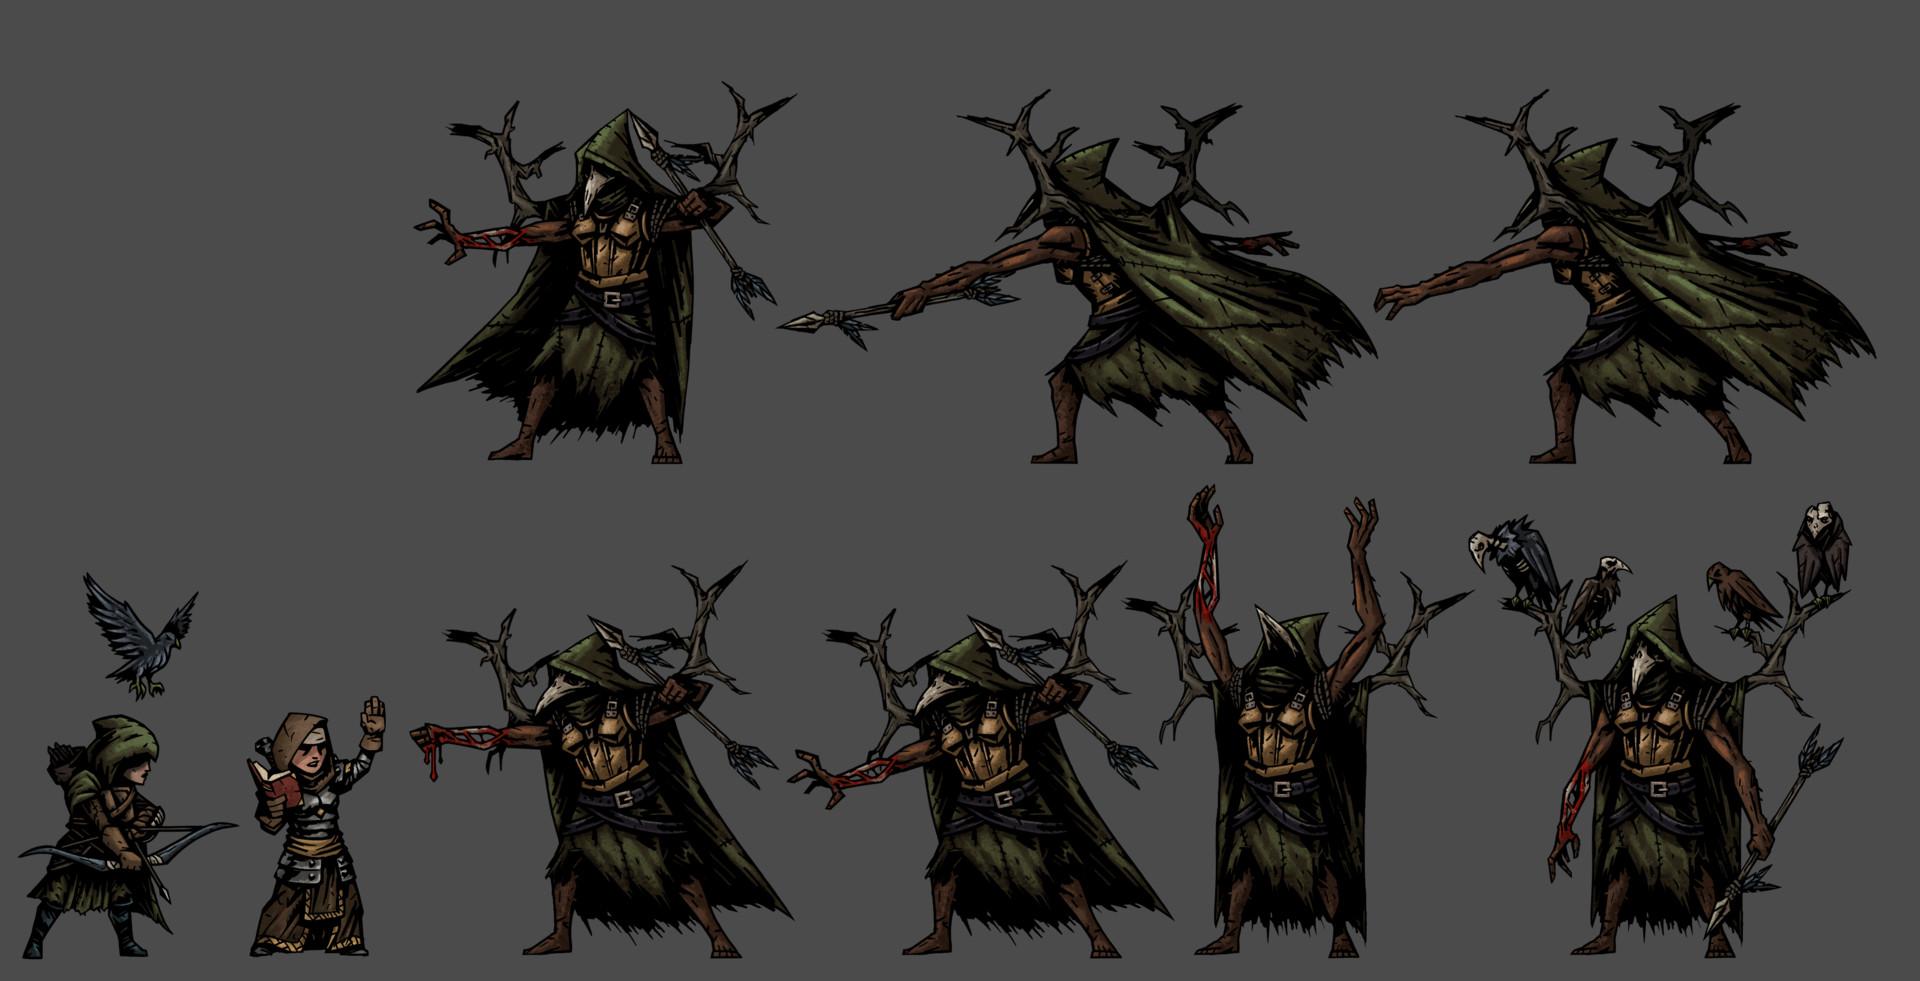 Marvin Seo Darkest Dungeon Mod Project Talon Brigands